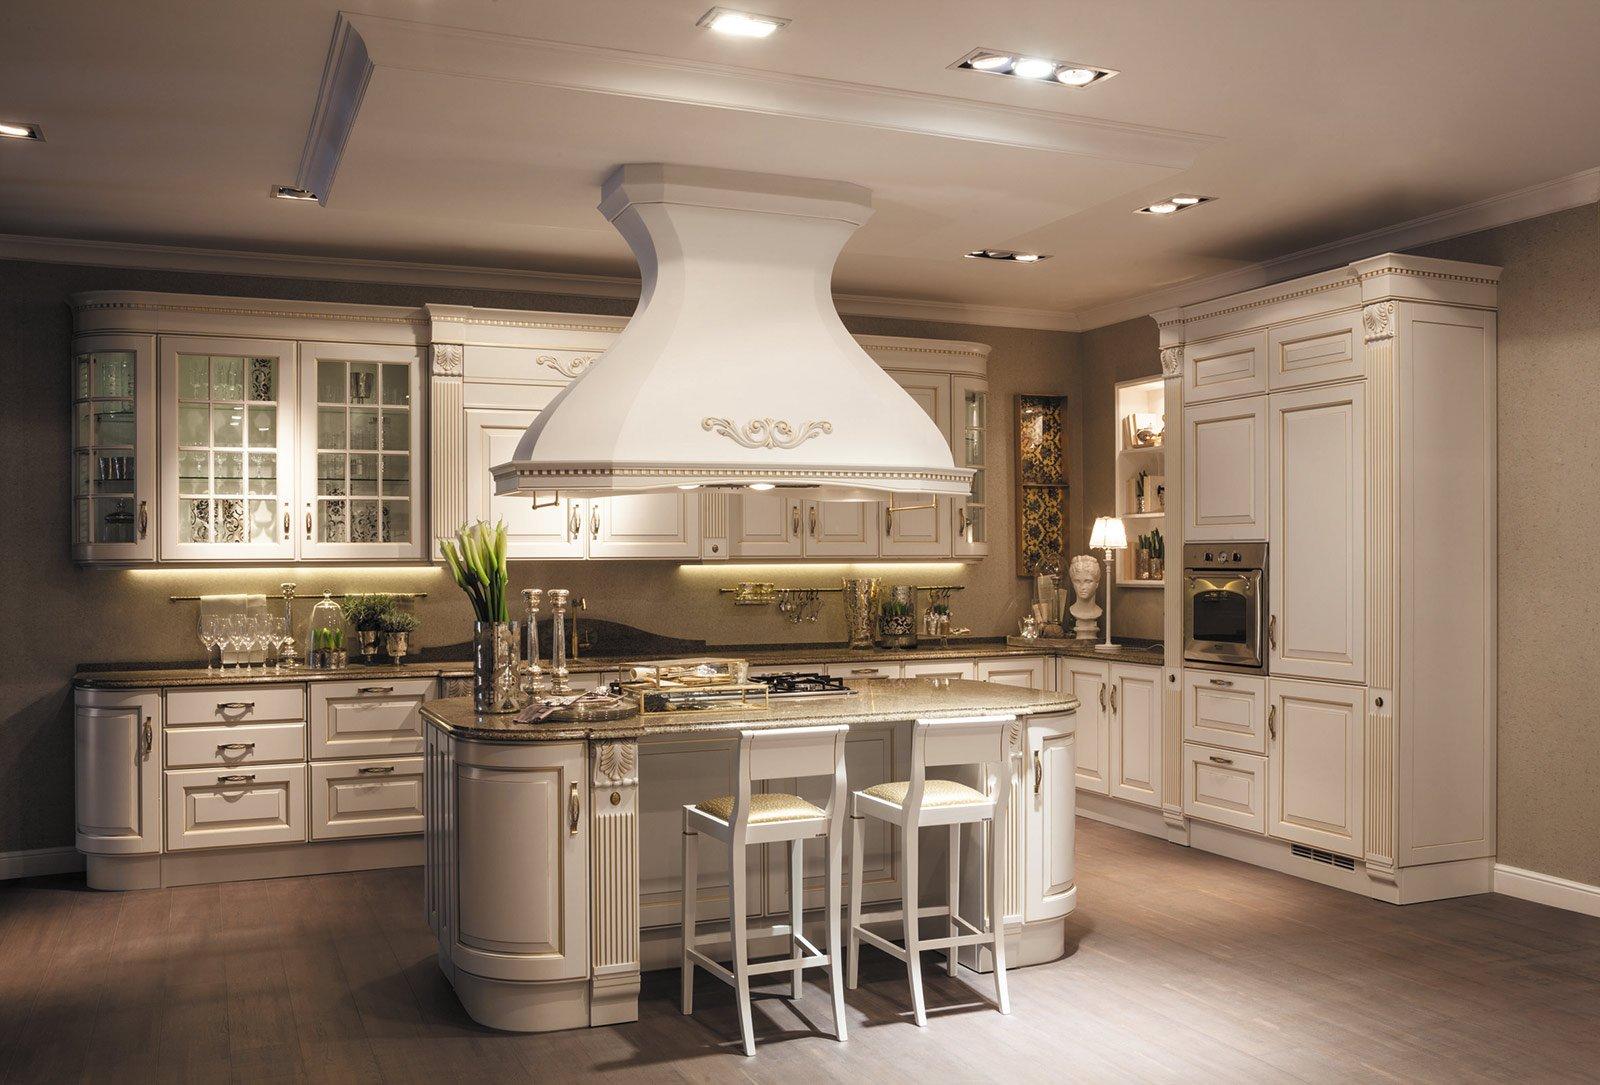 Cucine in stile cose di casa - Cucine scavolini country ...